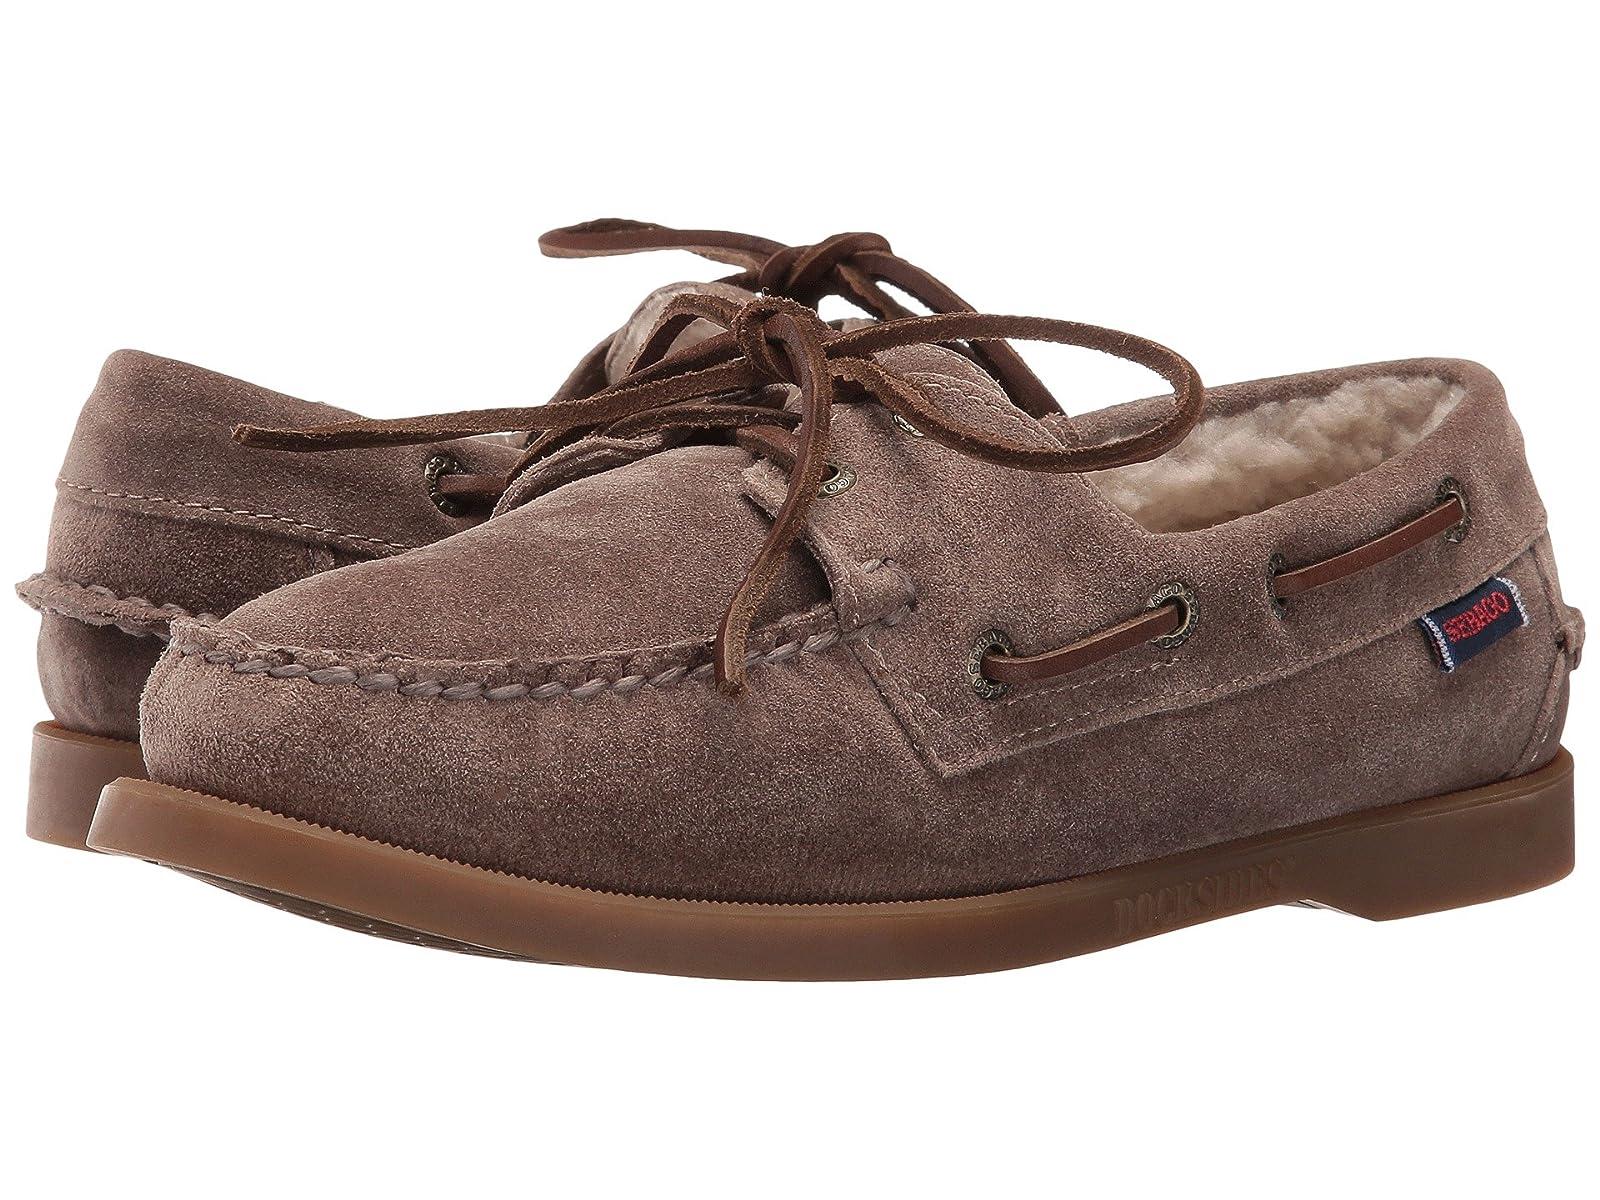 Sebago Dockside ShearlingCheap and distinctive eye-catching shoes